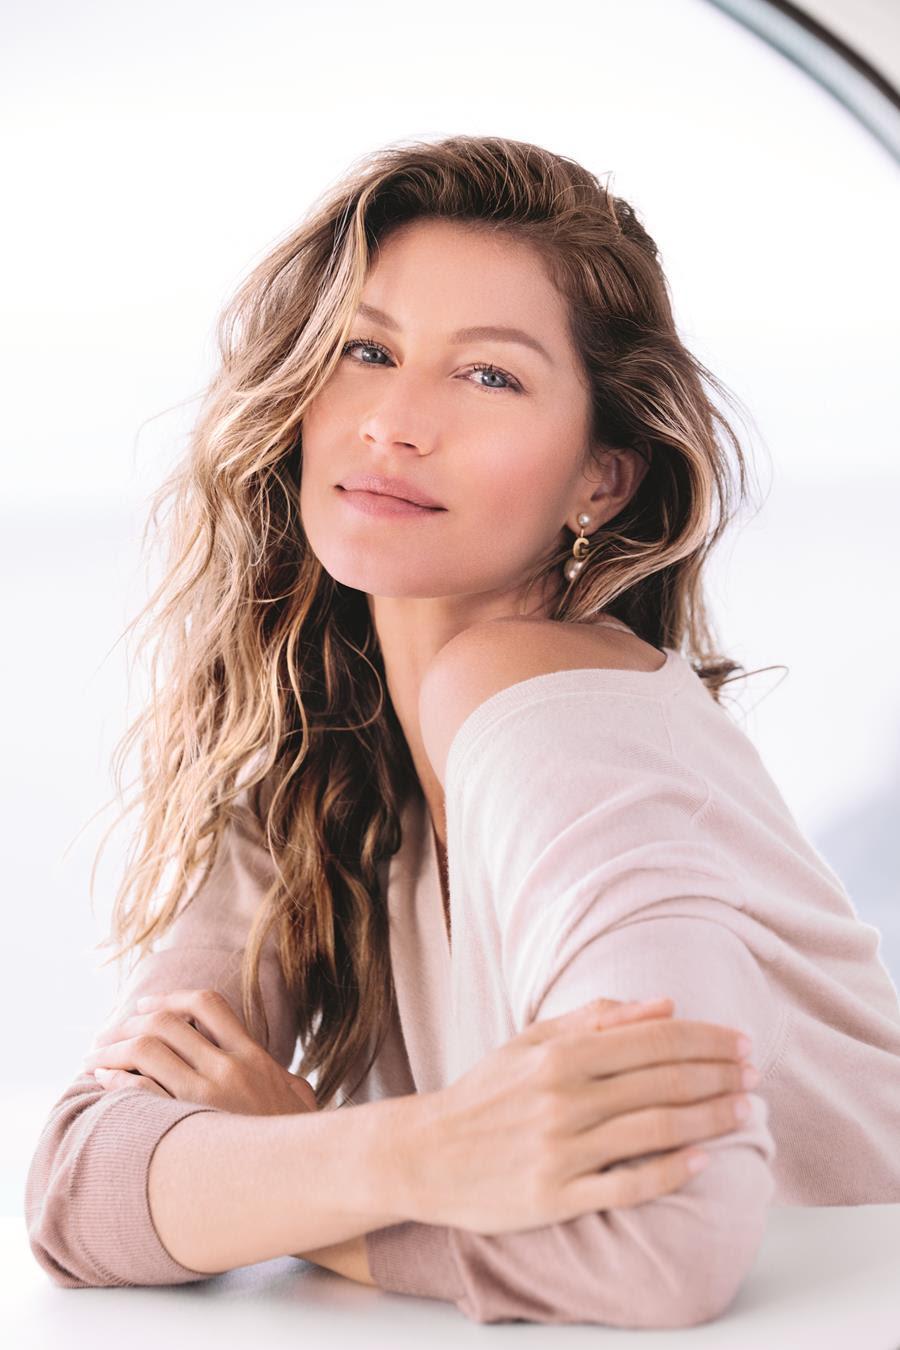 Gisele Bündchen, el nuevo rostro de Capture Totale de Dior